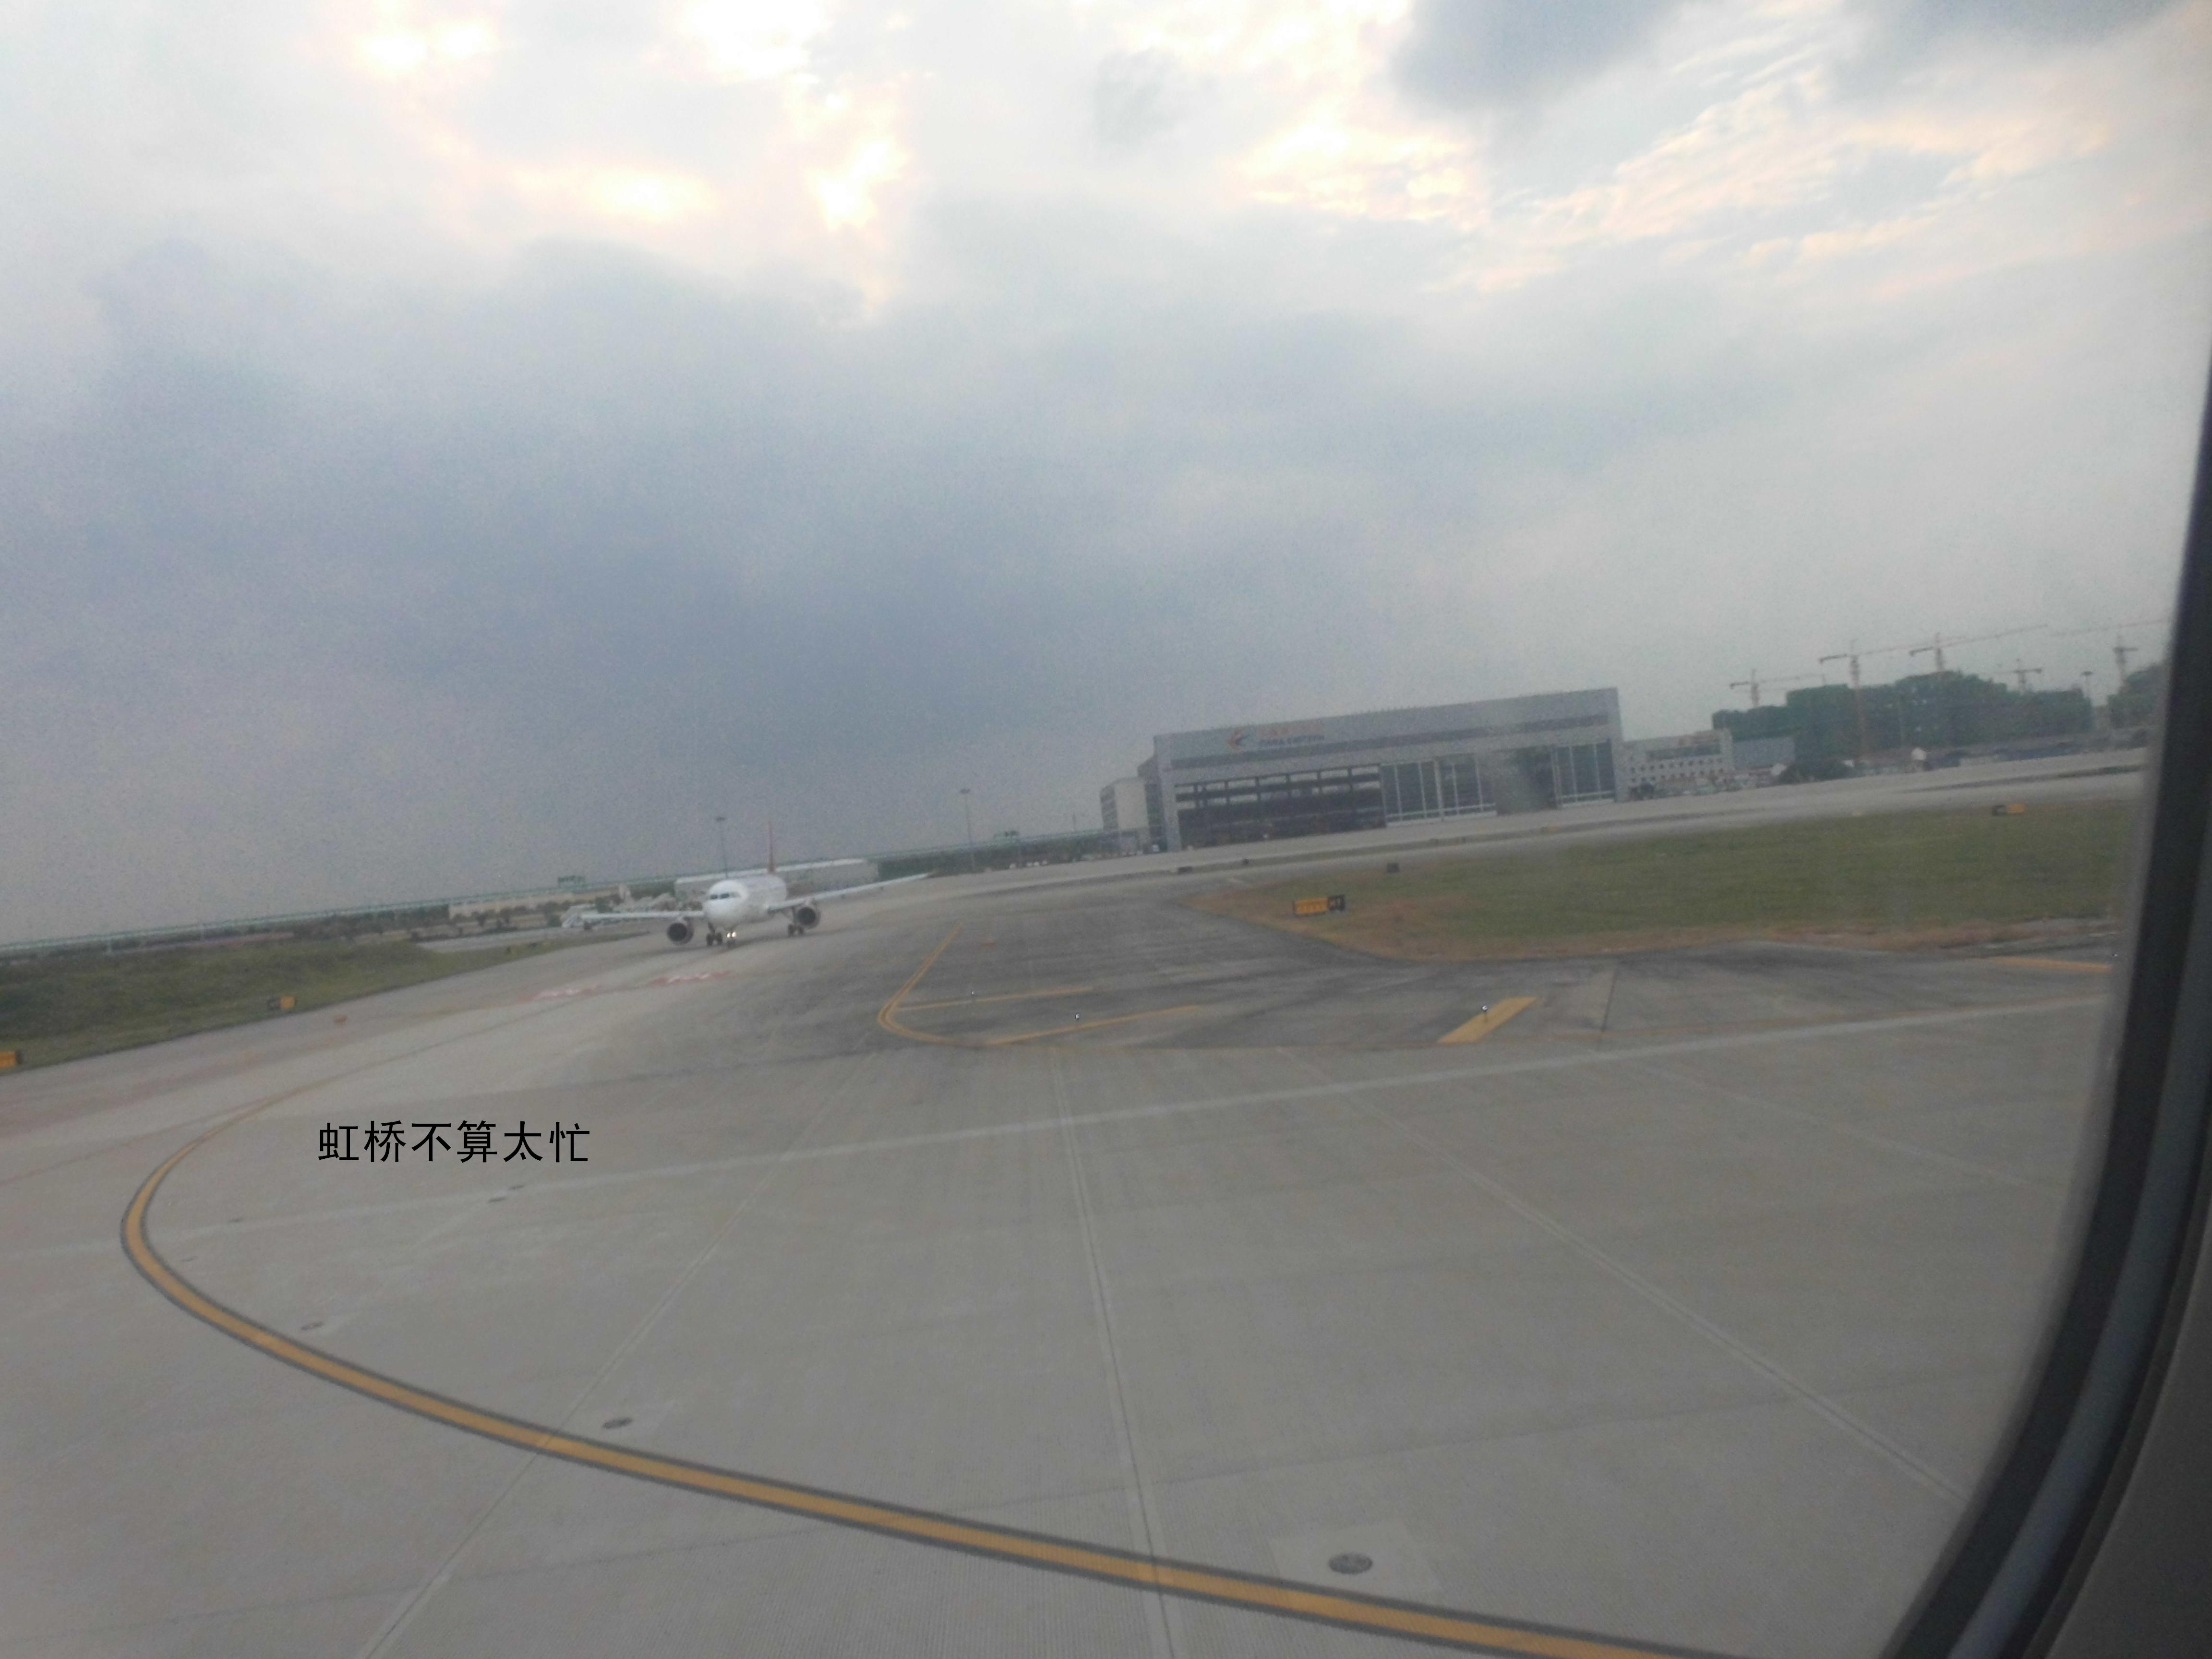 Re:[原创]新手第一帖(送女儿上大学)照片太大不知道怎样缩小,请各位看官自己缩小到25%欣赏 AIRBUS A320 B6310 客舱 中国上海虹桥国际机场